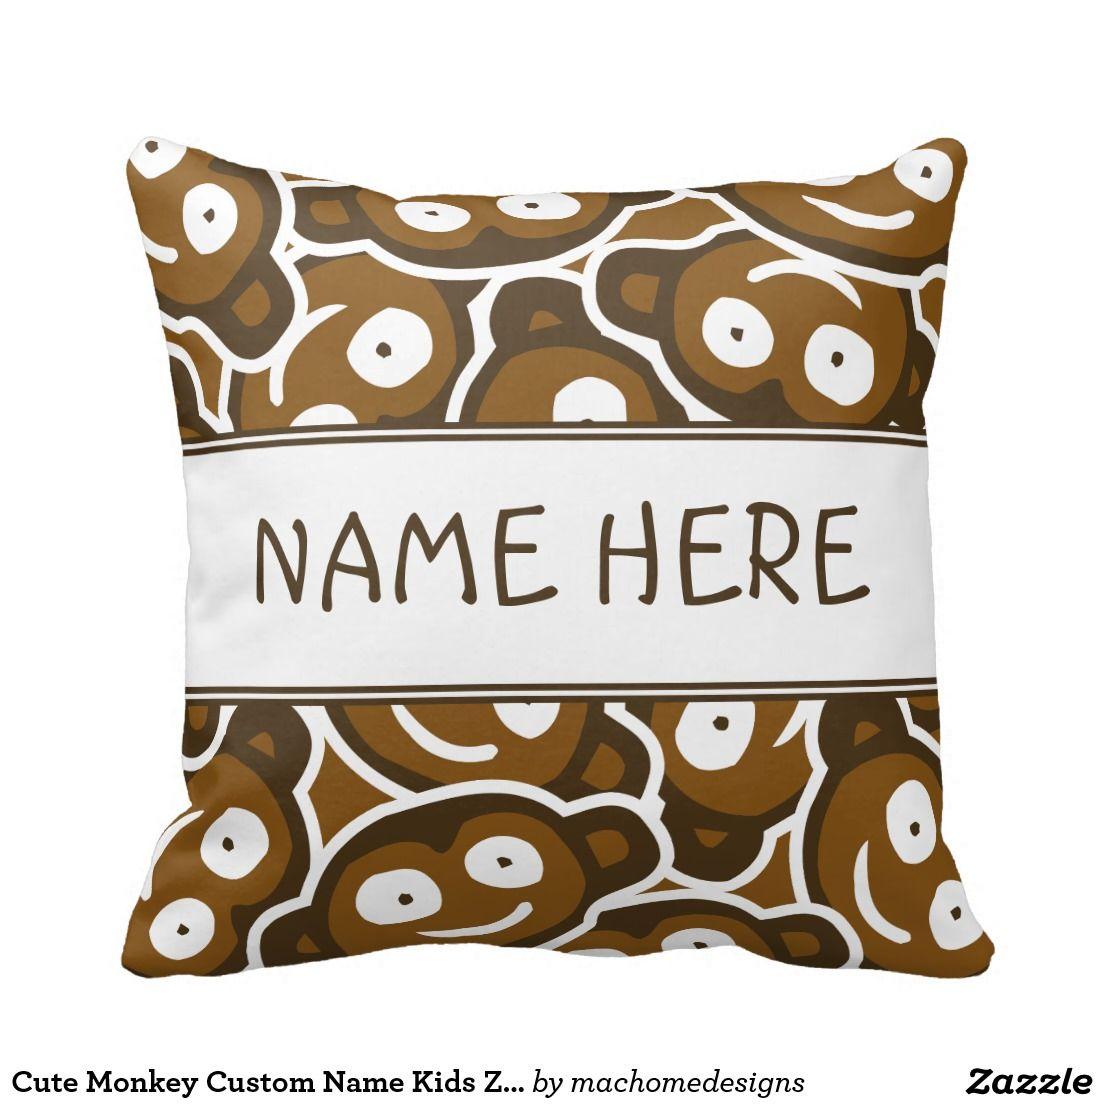 Cute monkey custom name kids zoo animals pillow monogrammed and